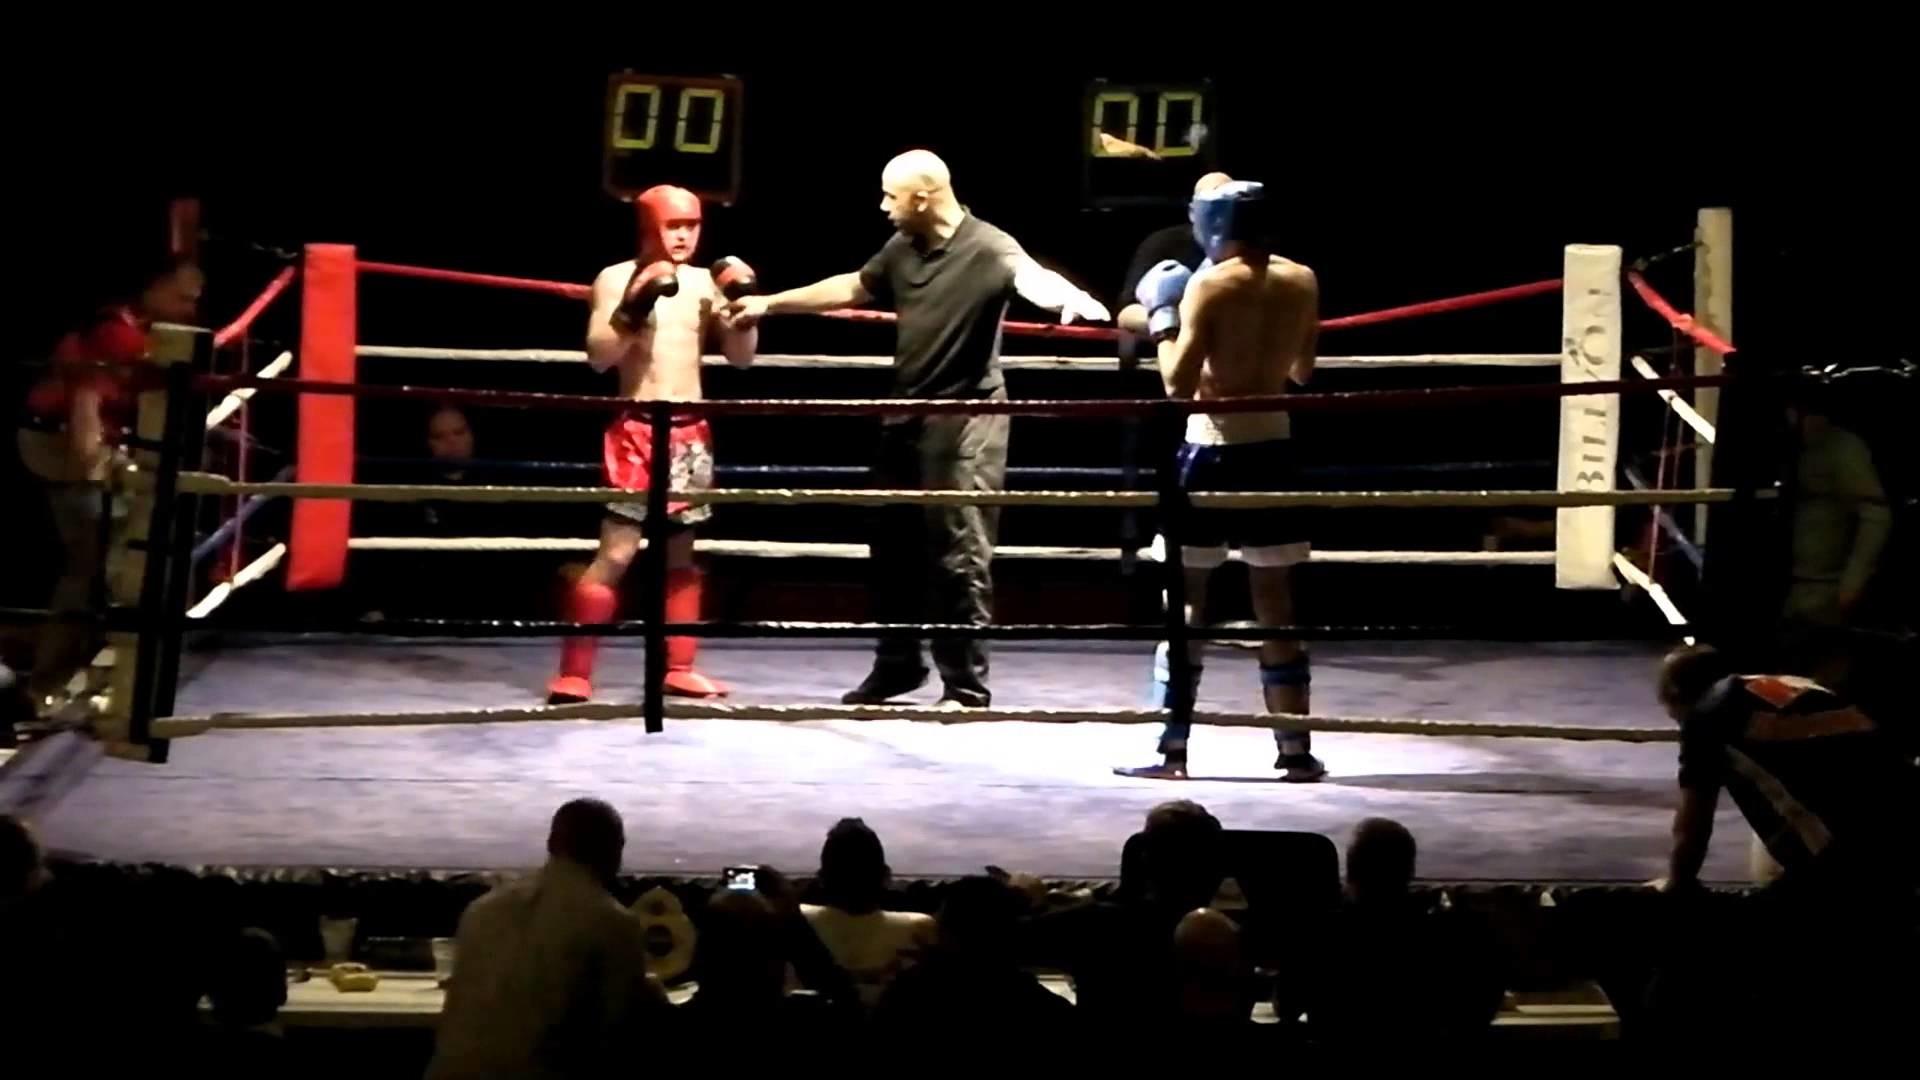 Brock Lesnar Hd Wallpaper Kick Boxing Wallpaper 73 Immagini